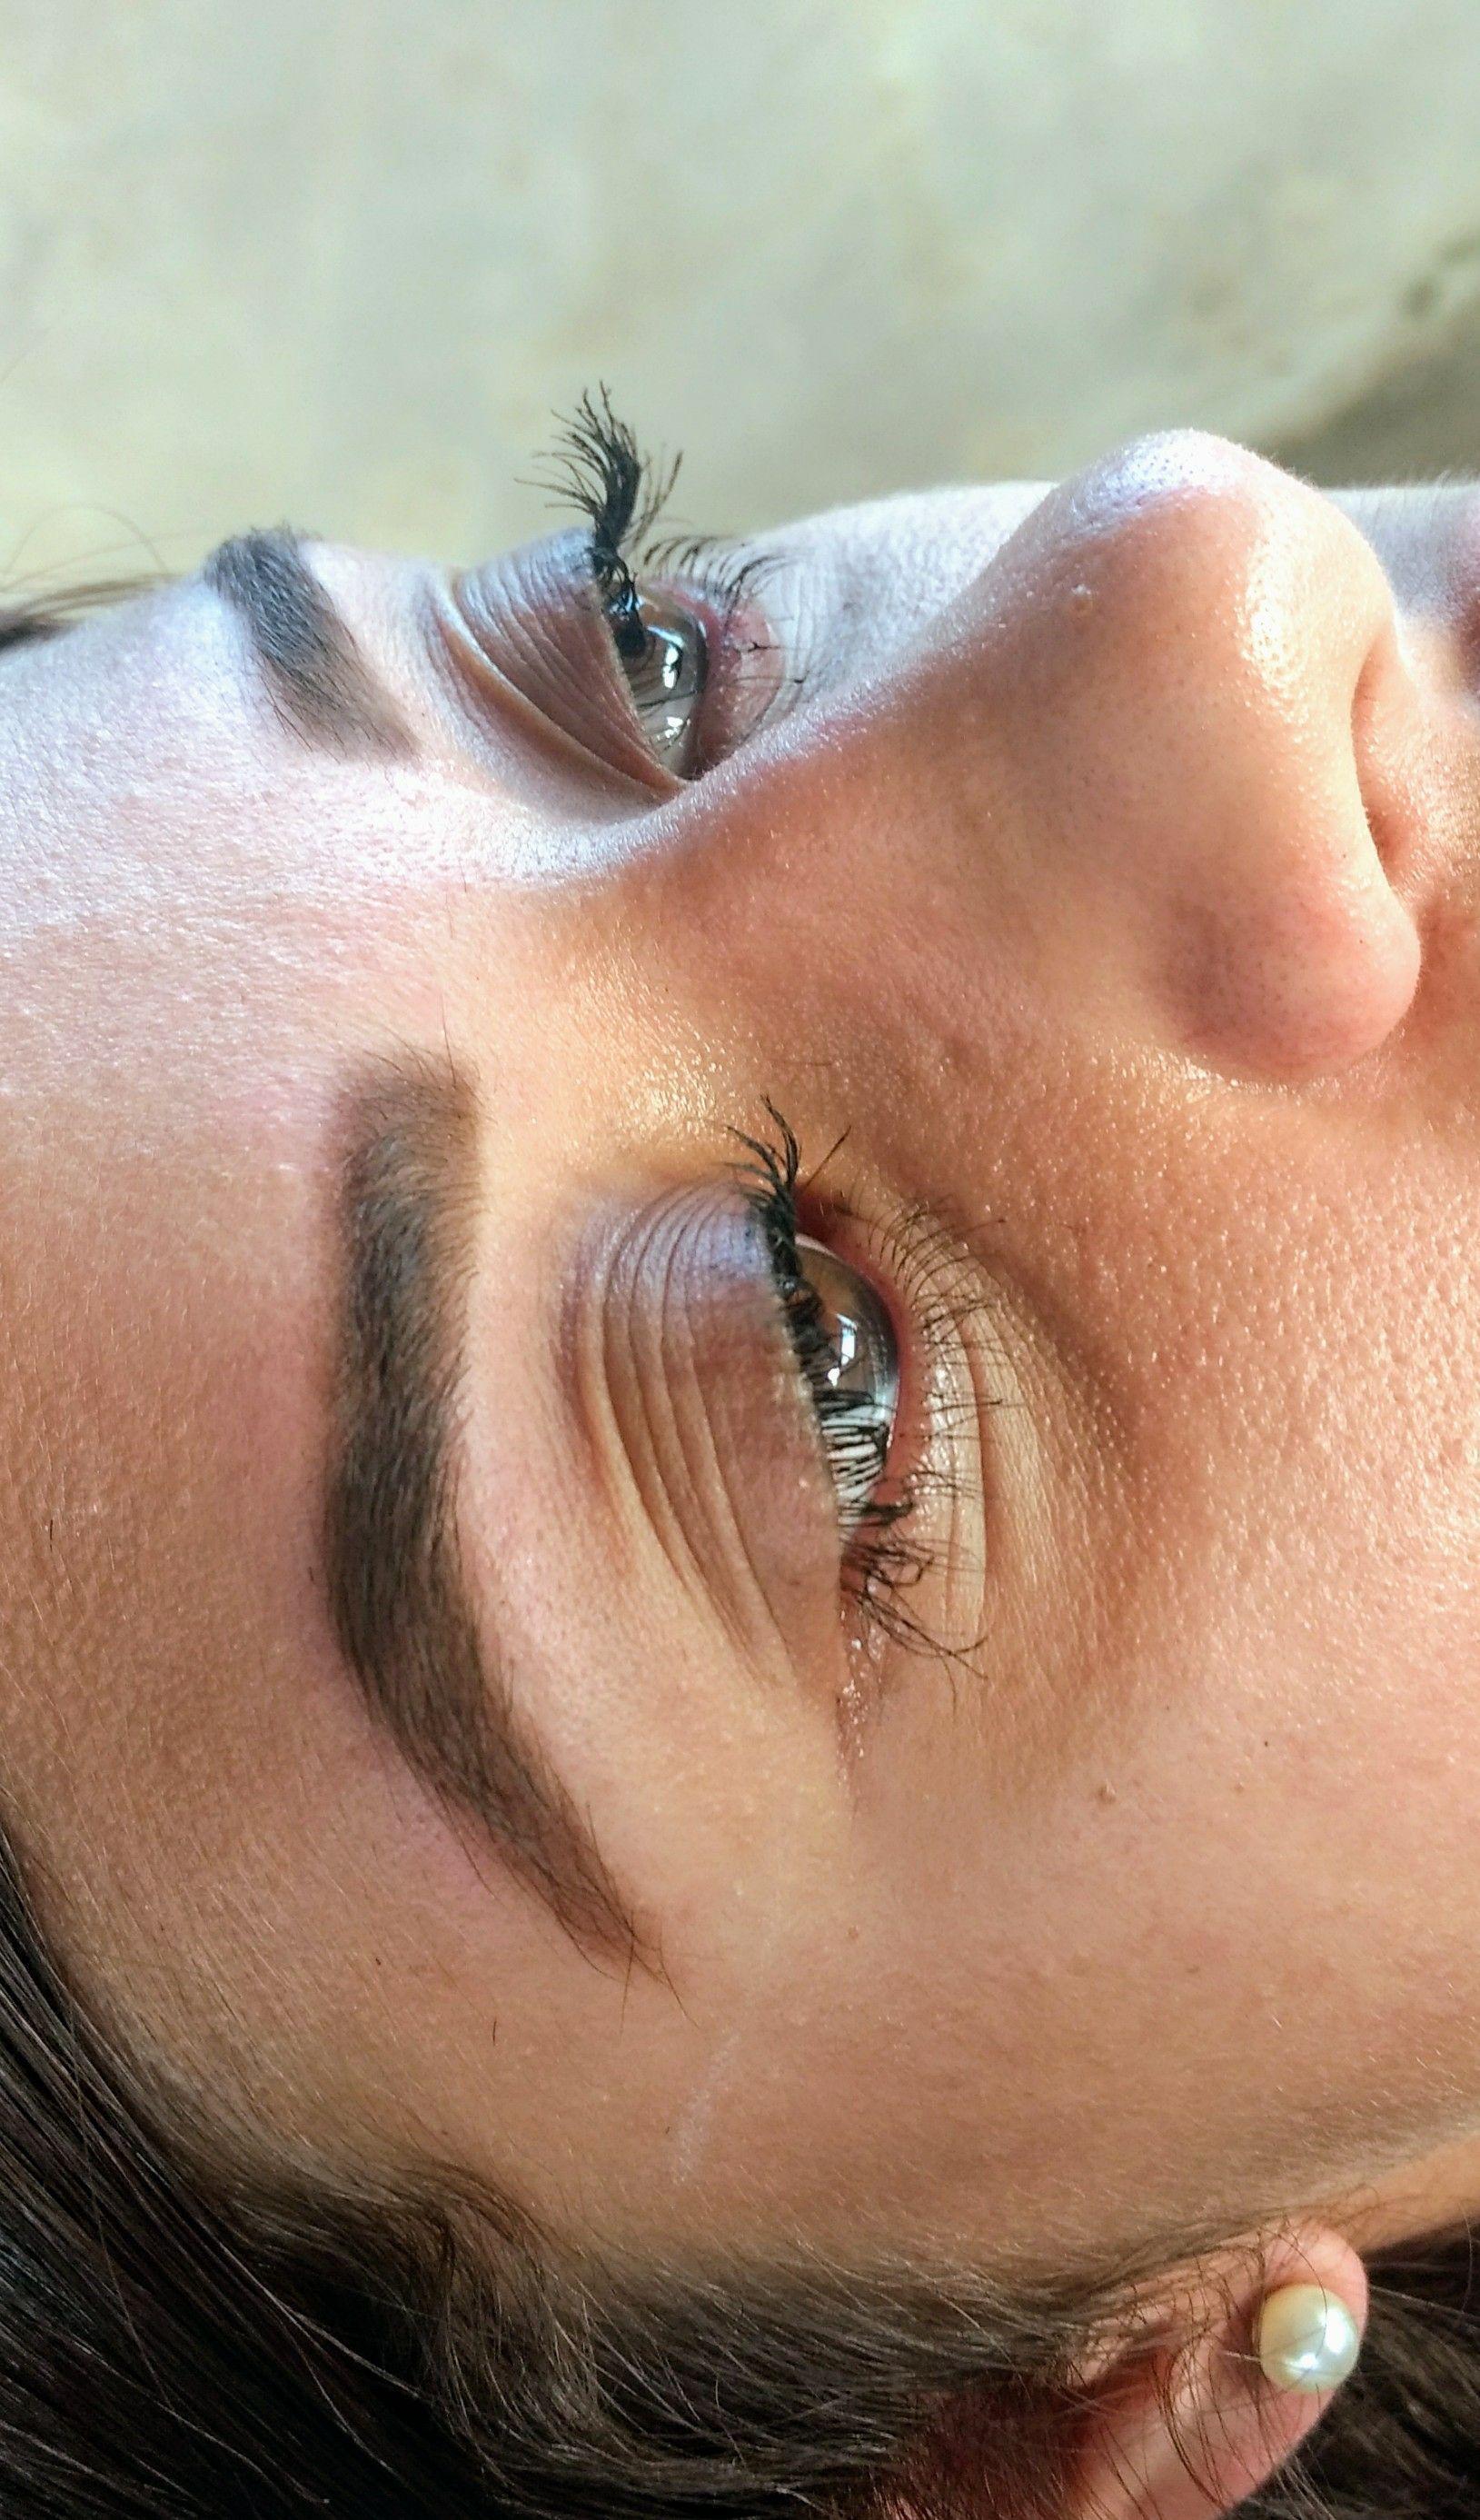 estética designer de sobrancelhas auxiliar administrativo designer de sobrancelhas designer de sobrancelhas designer de sobrancelhas